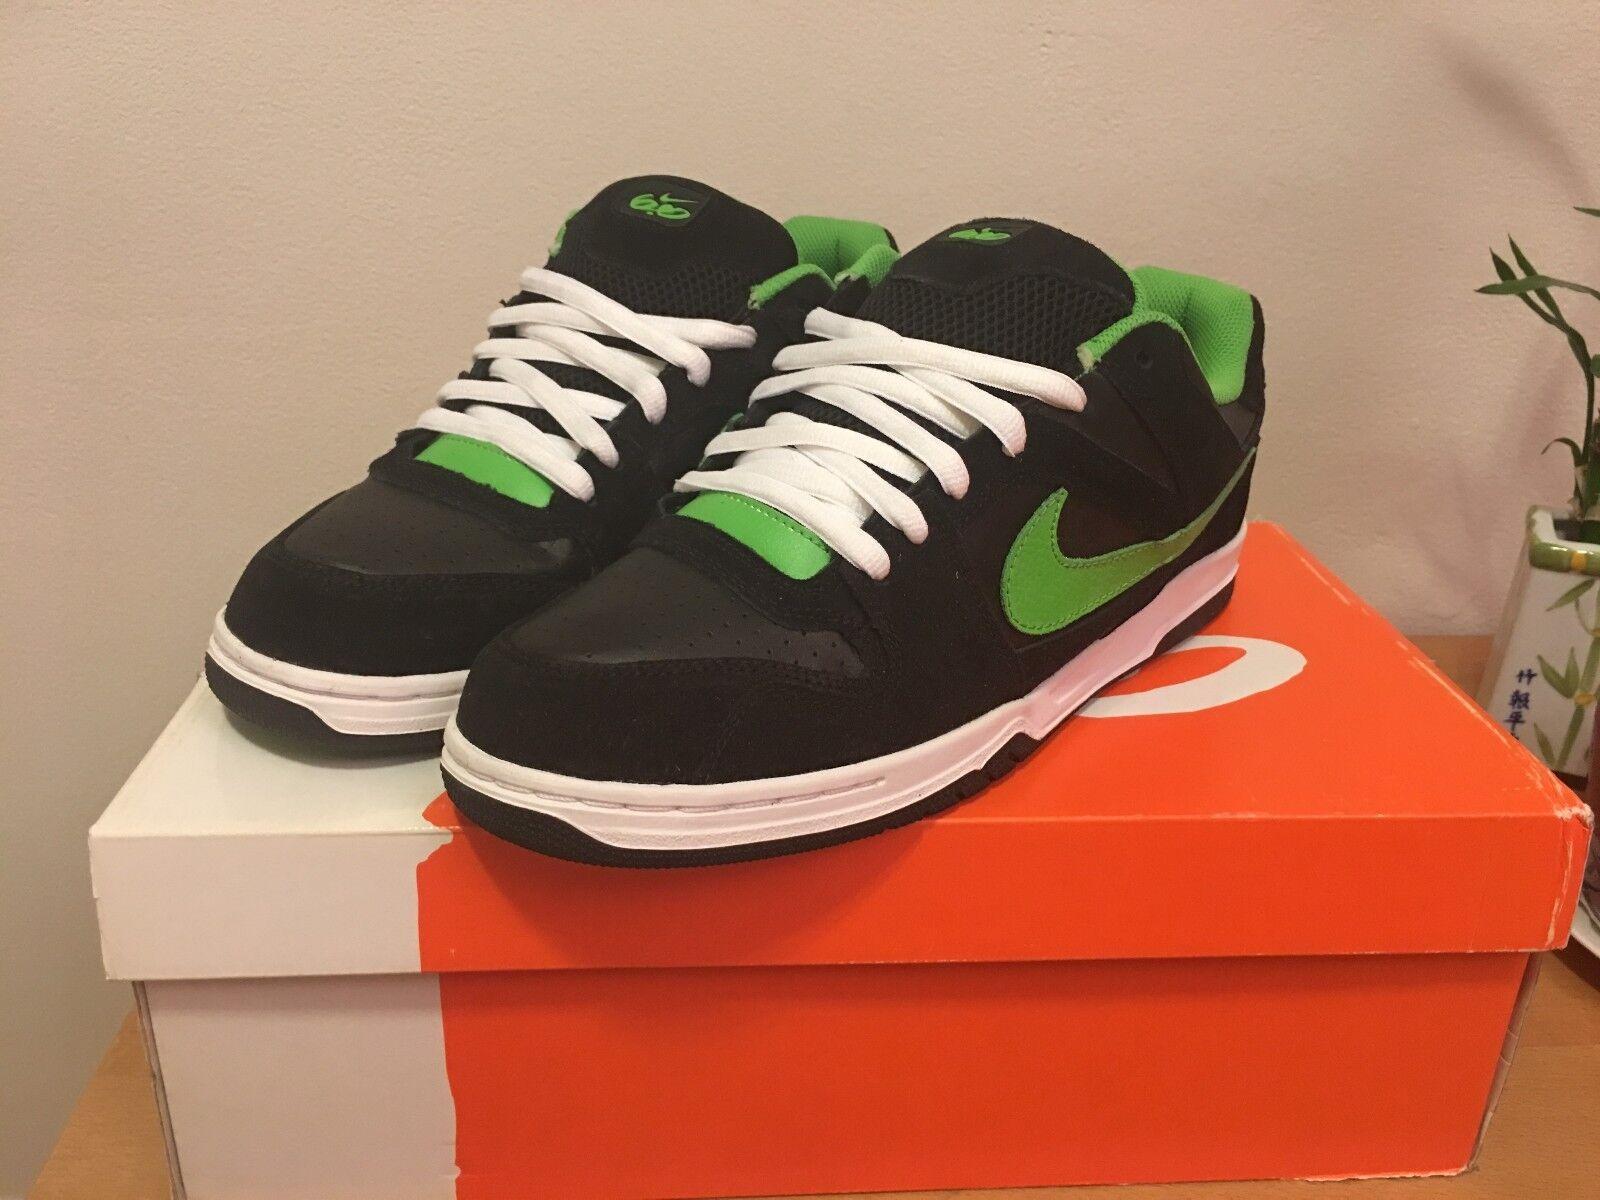 Nike Encore Zoom Men's Size 11.5 (Black/Green) NEW - BRAND NEW (Black/Green) IN BOX d9bf2b